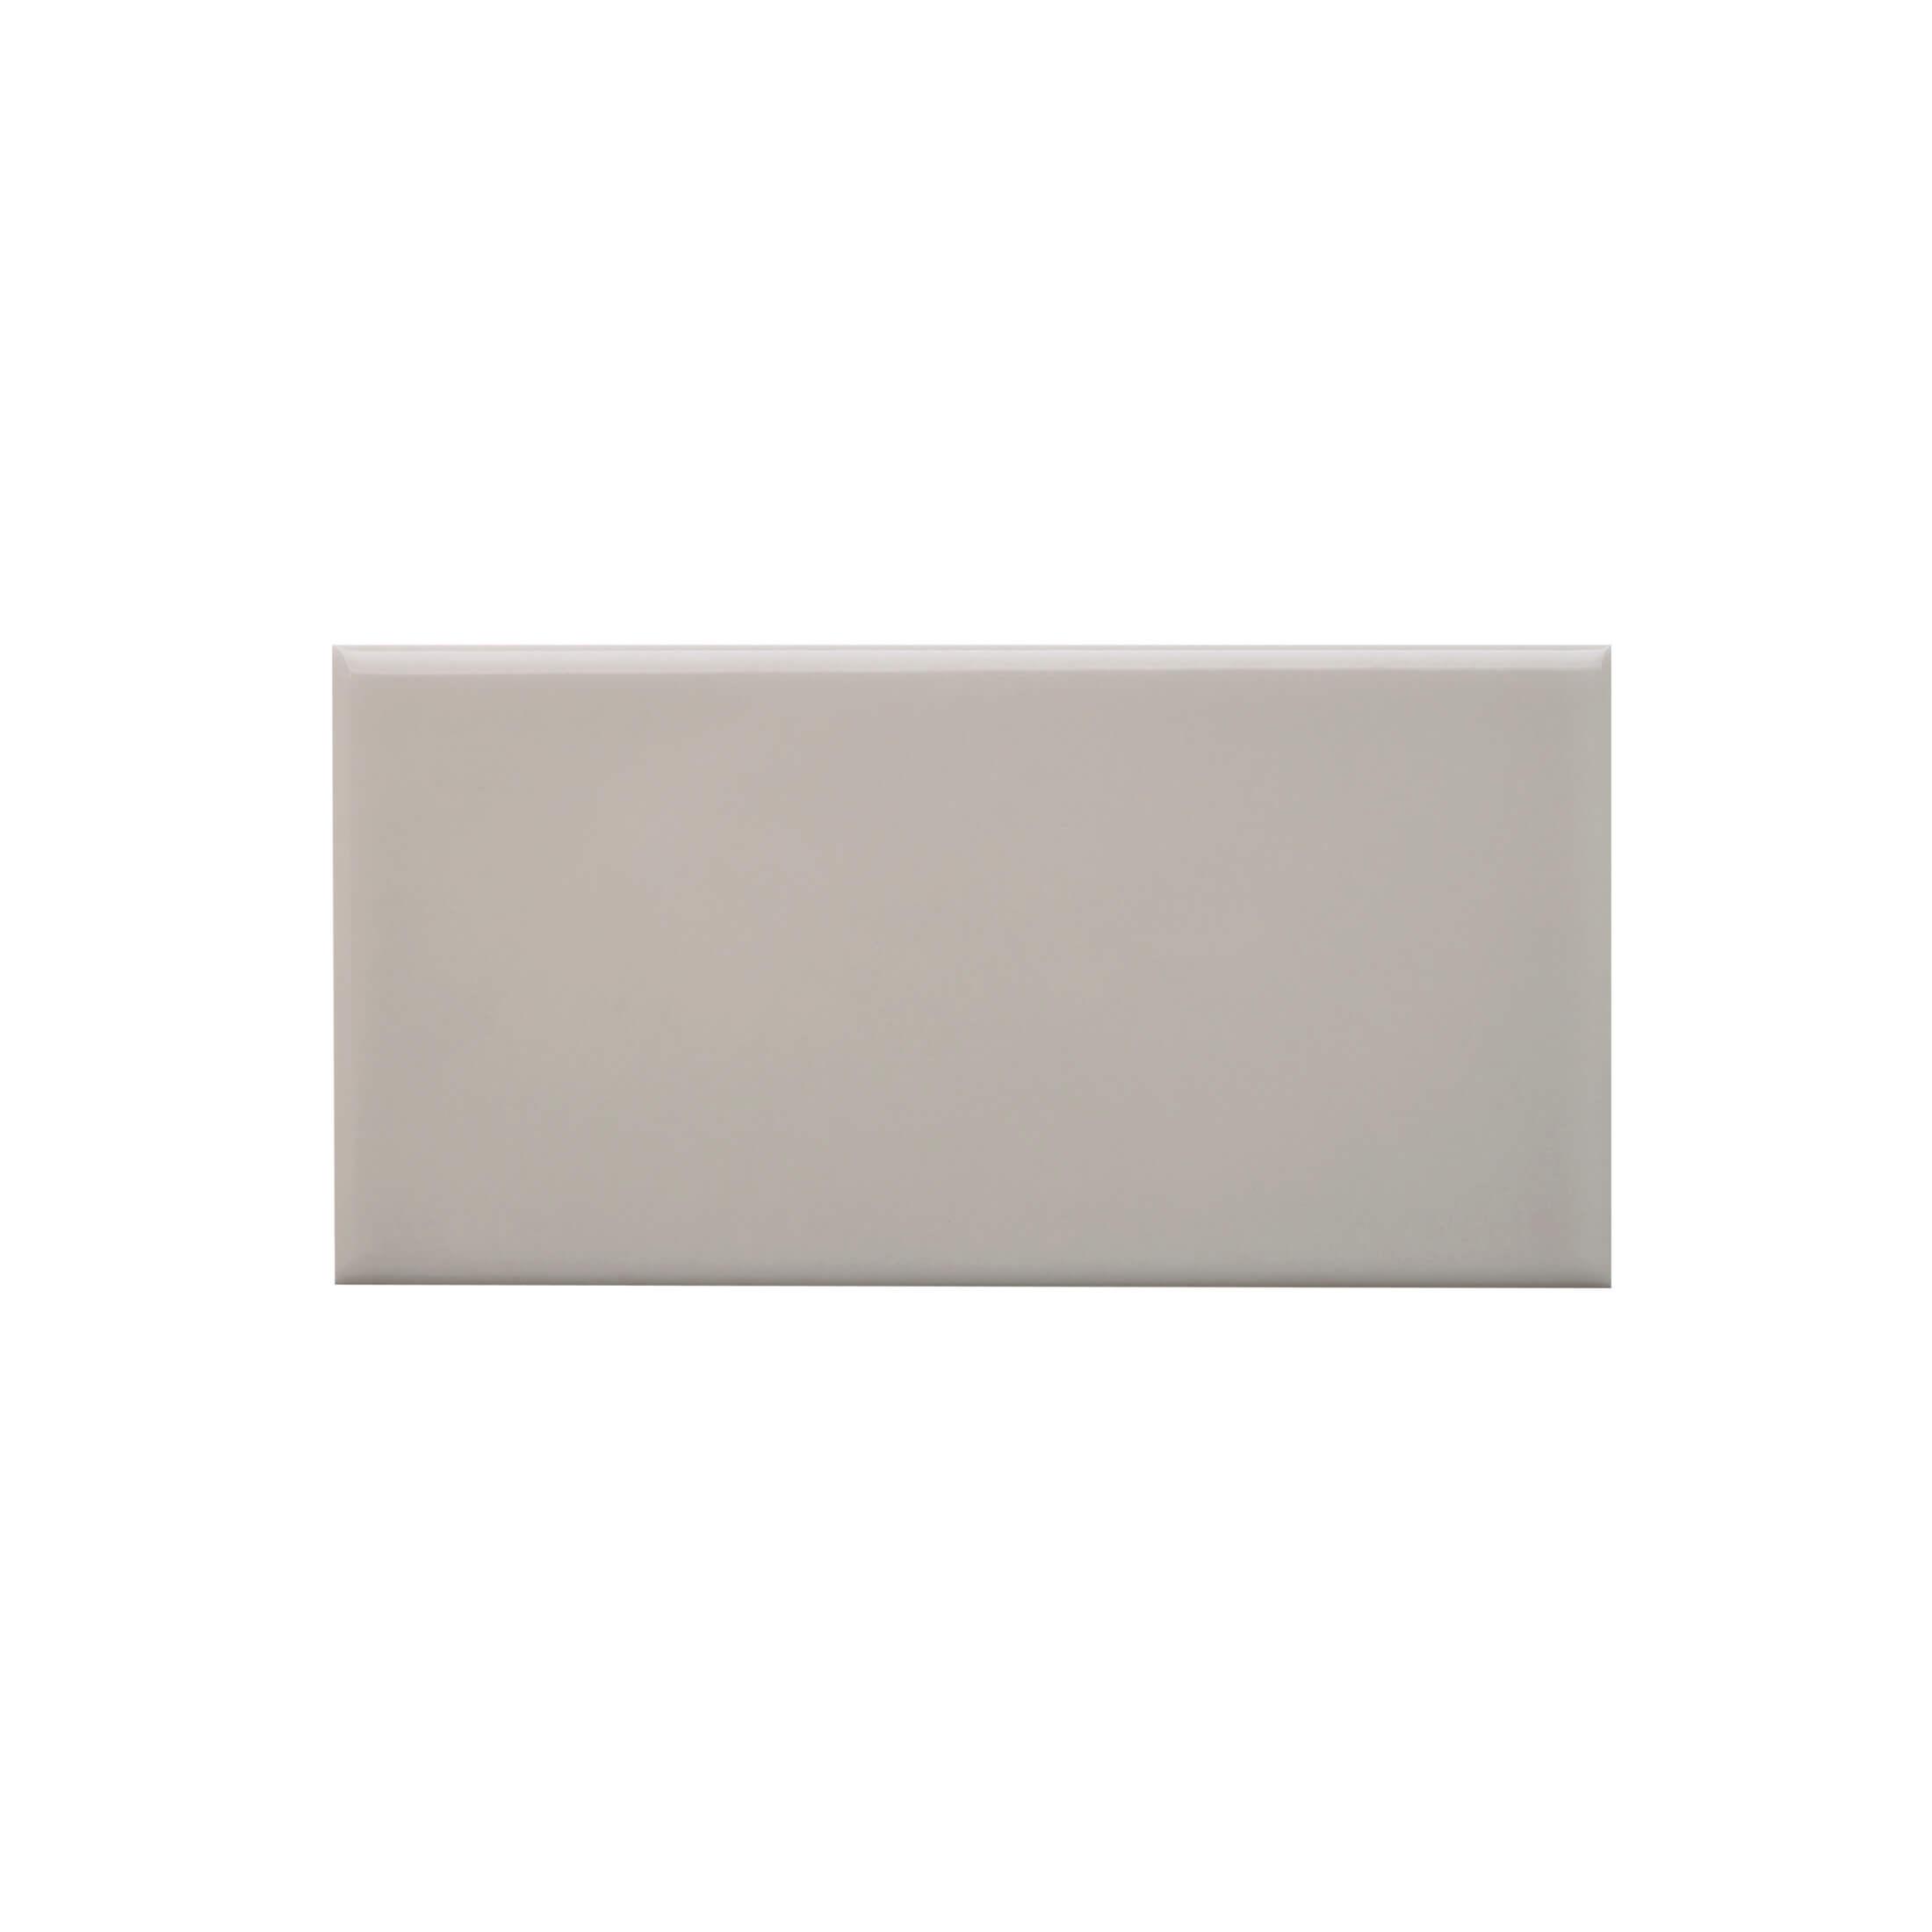 ADNE1093 - LISO PB - 10 cm X 20 cm